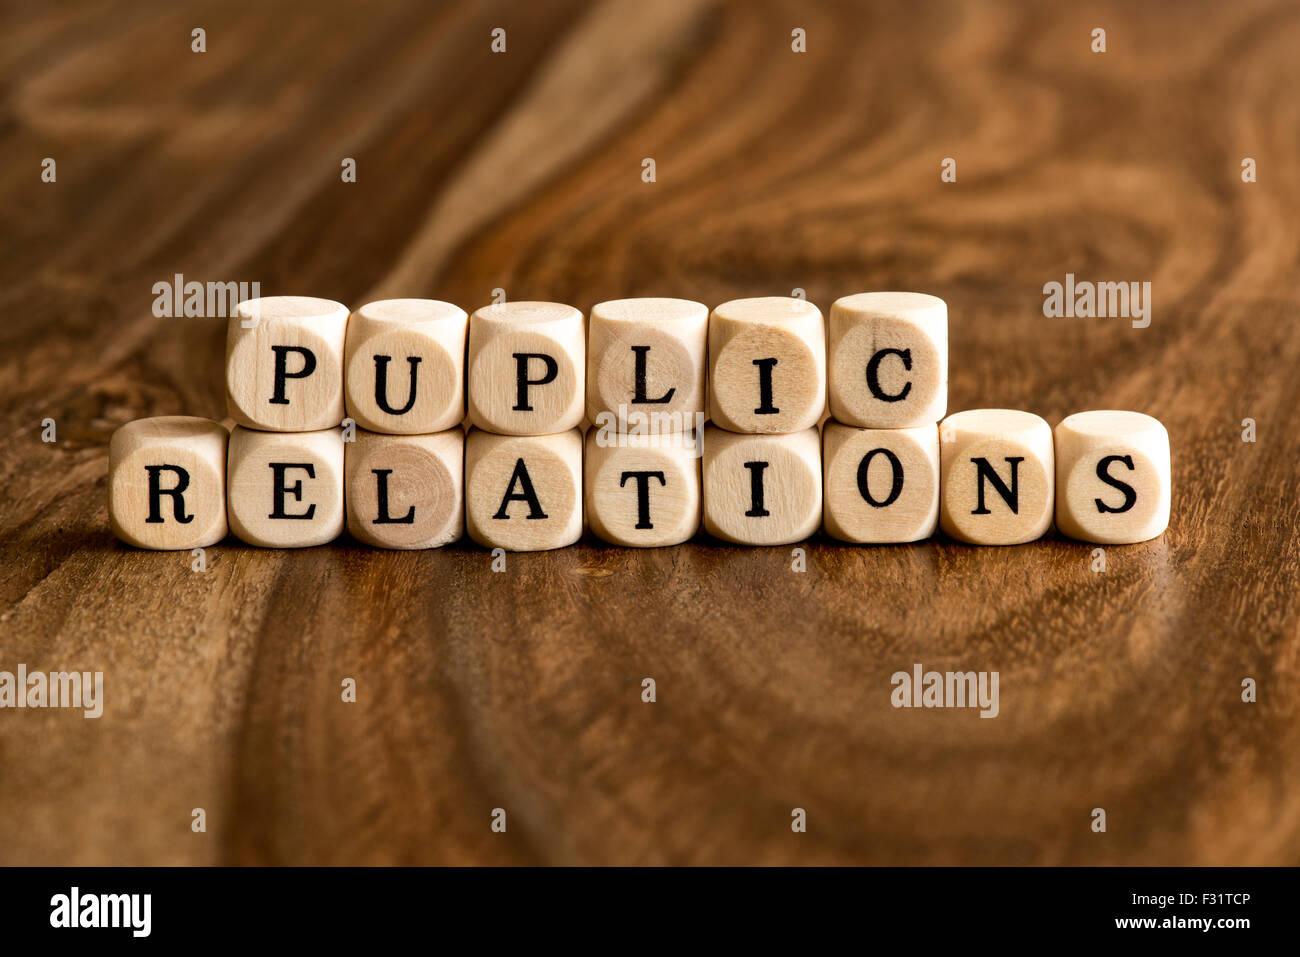 PUPLIC RELATIONS word background on wood blocks - Stock Image